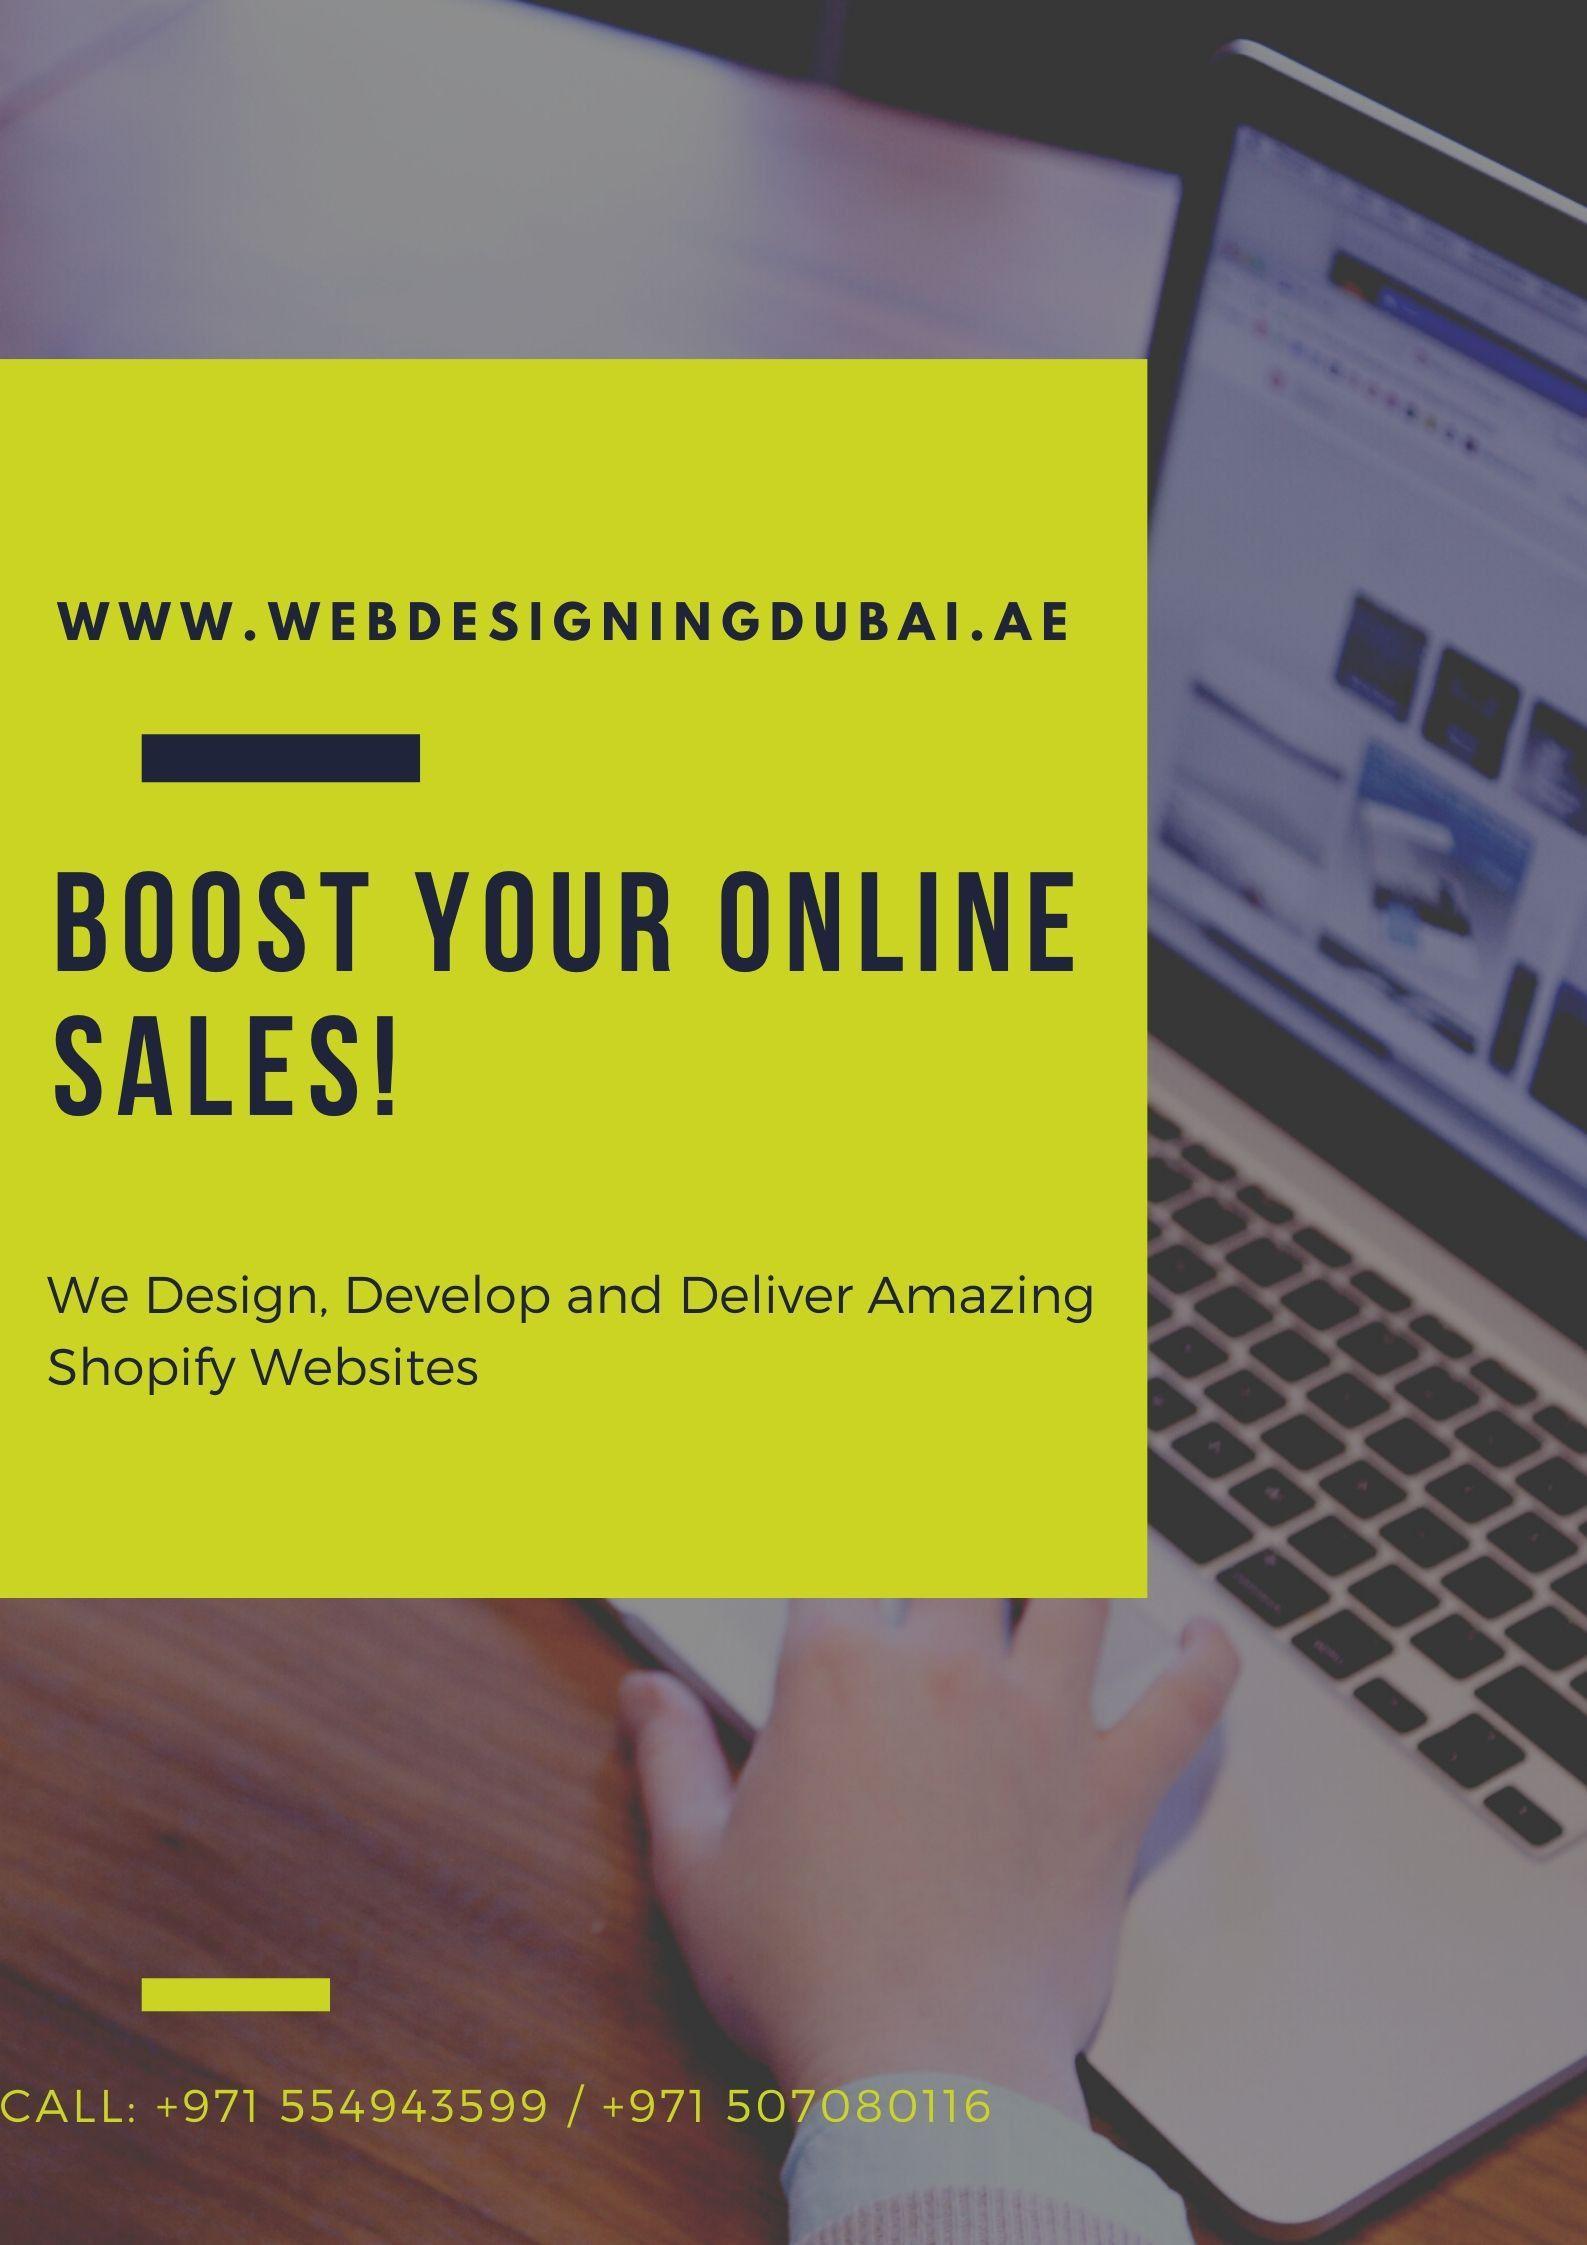 M A Q Computer LLC Services | Web Designing Dubai 4